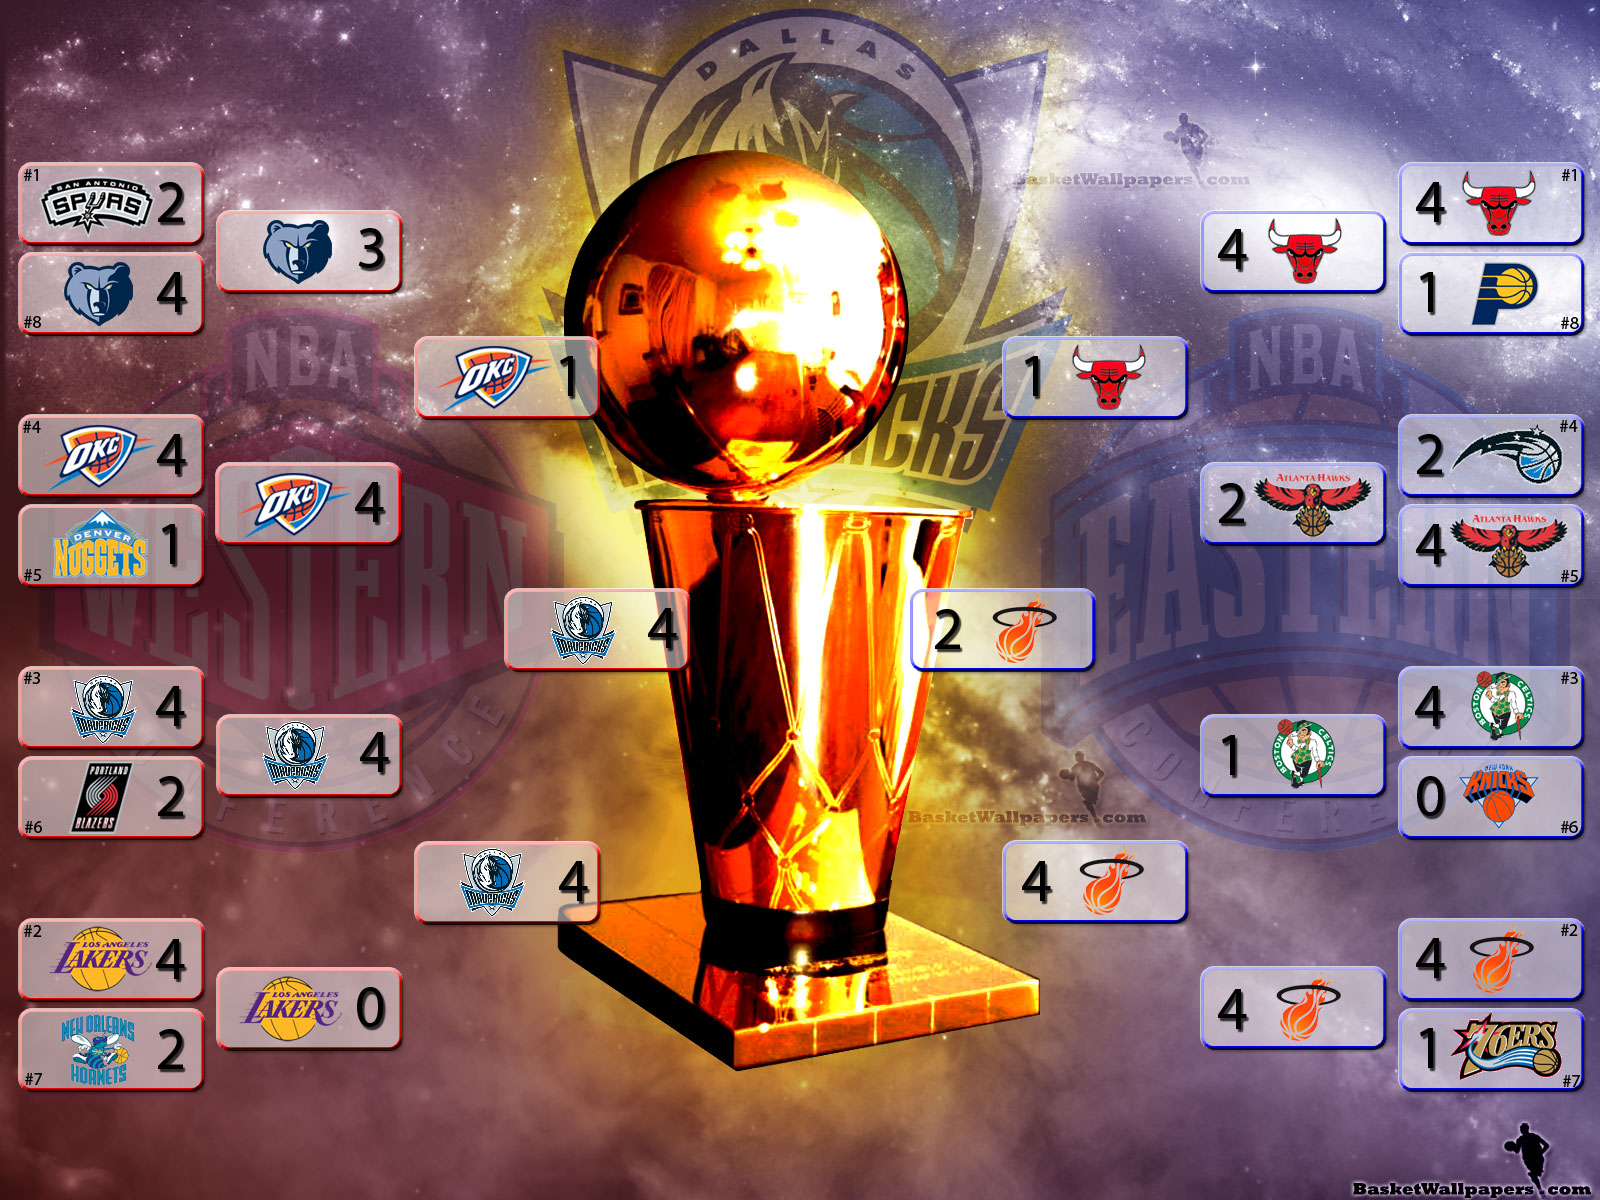 Dallas Mavericks 2011 NBA Champions Wallpaper